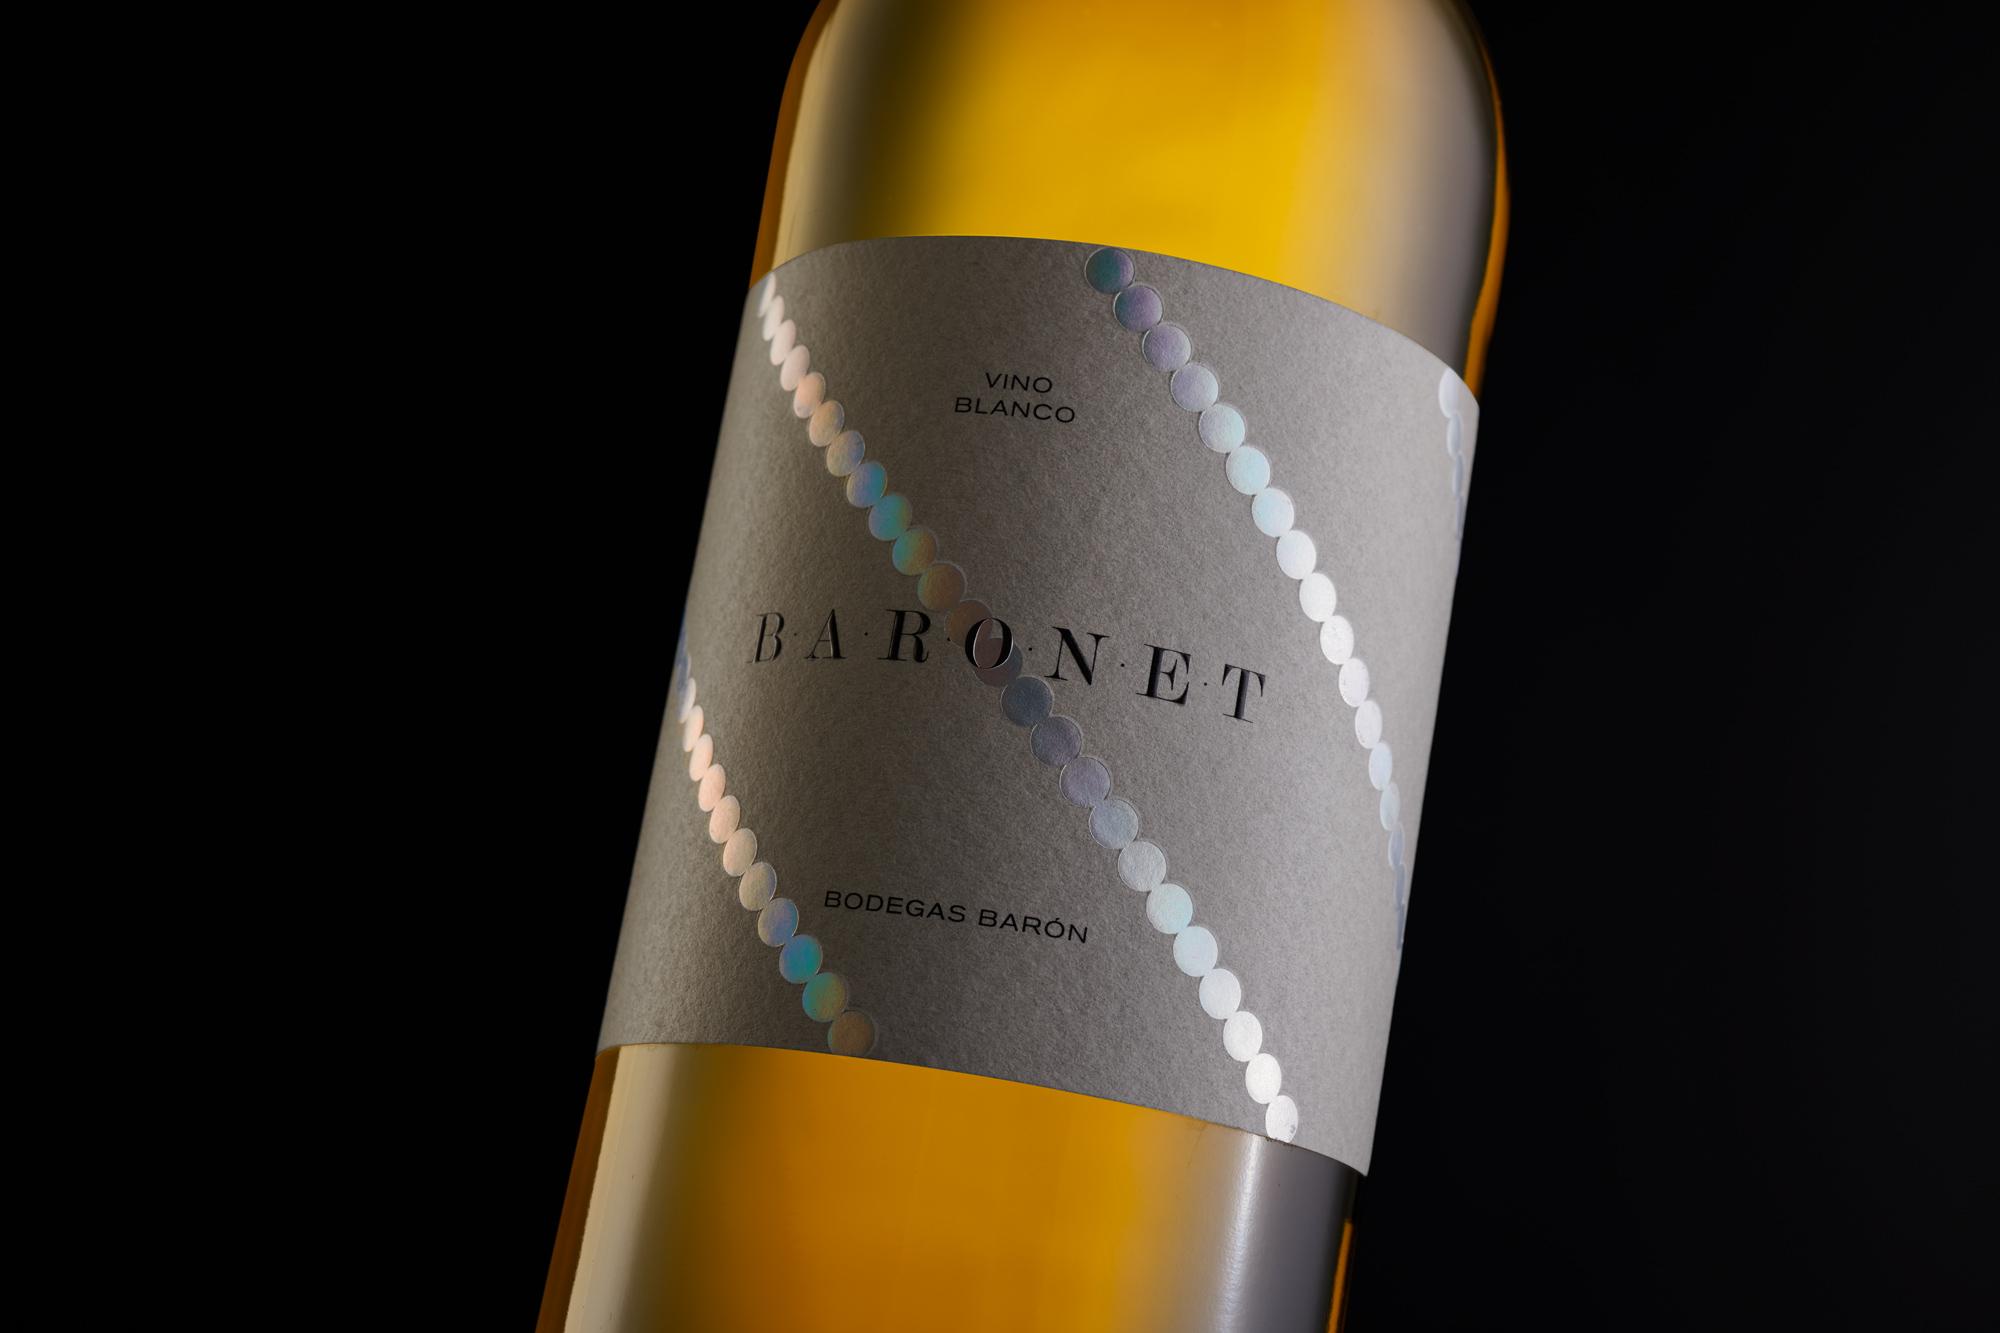 Baronet3